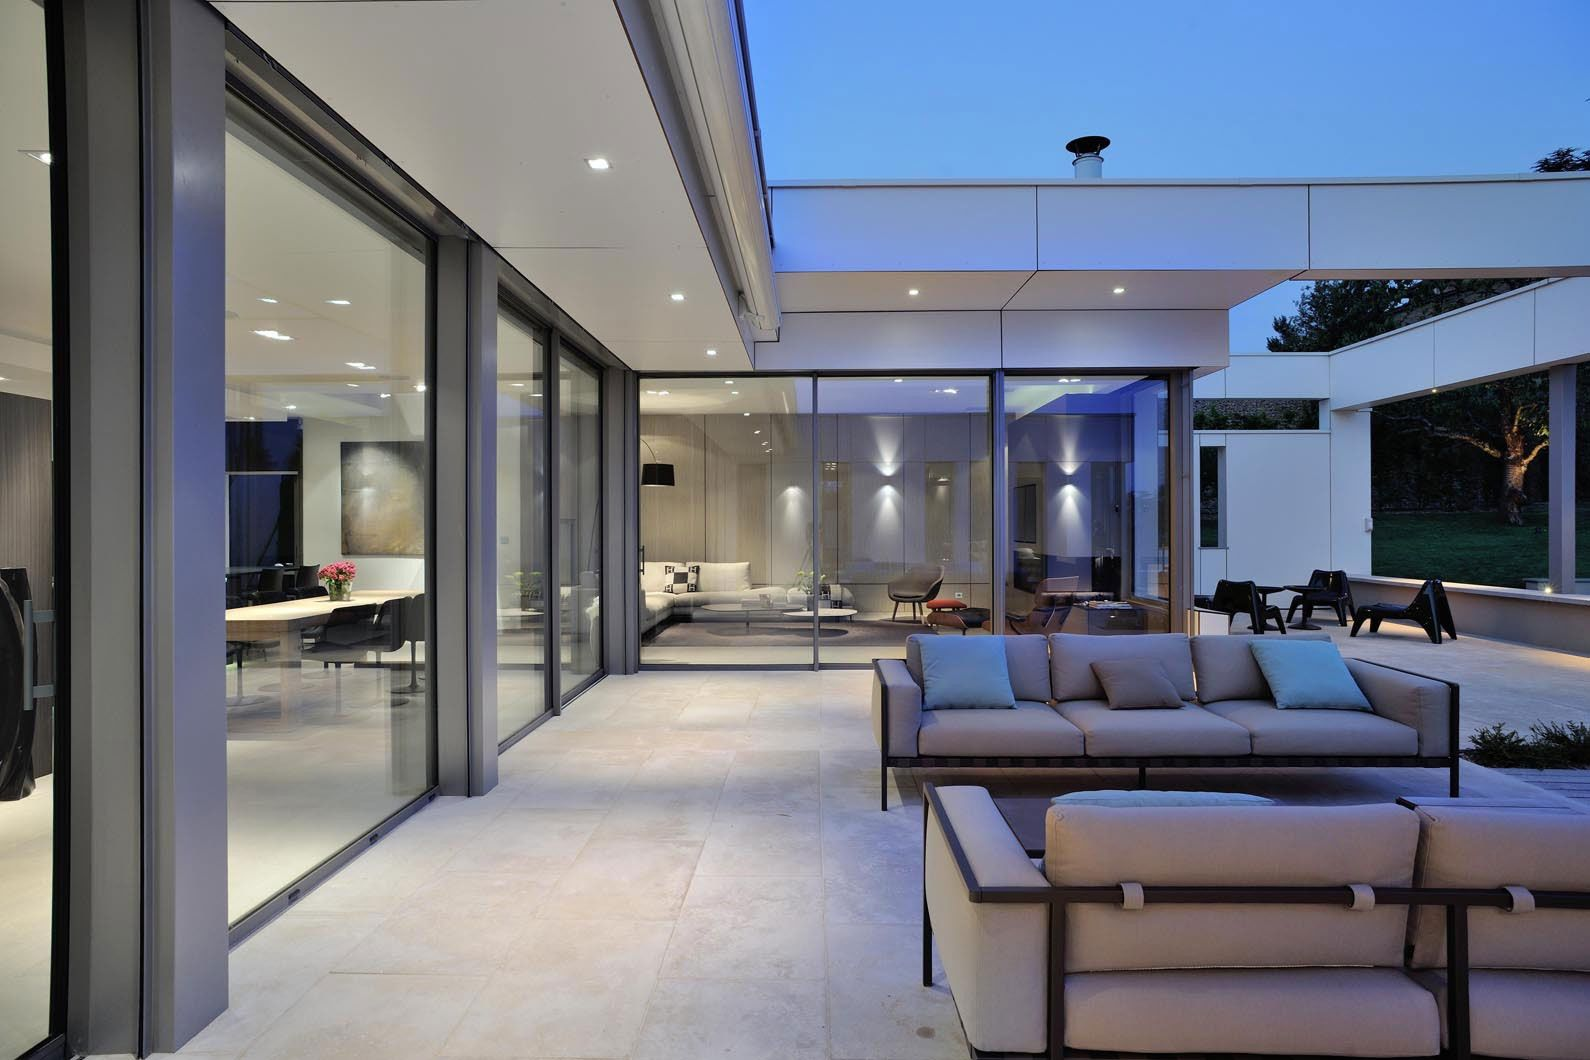 Villa wa by laurent guillaud lozanne 16